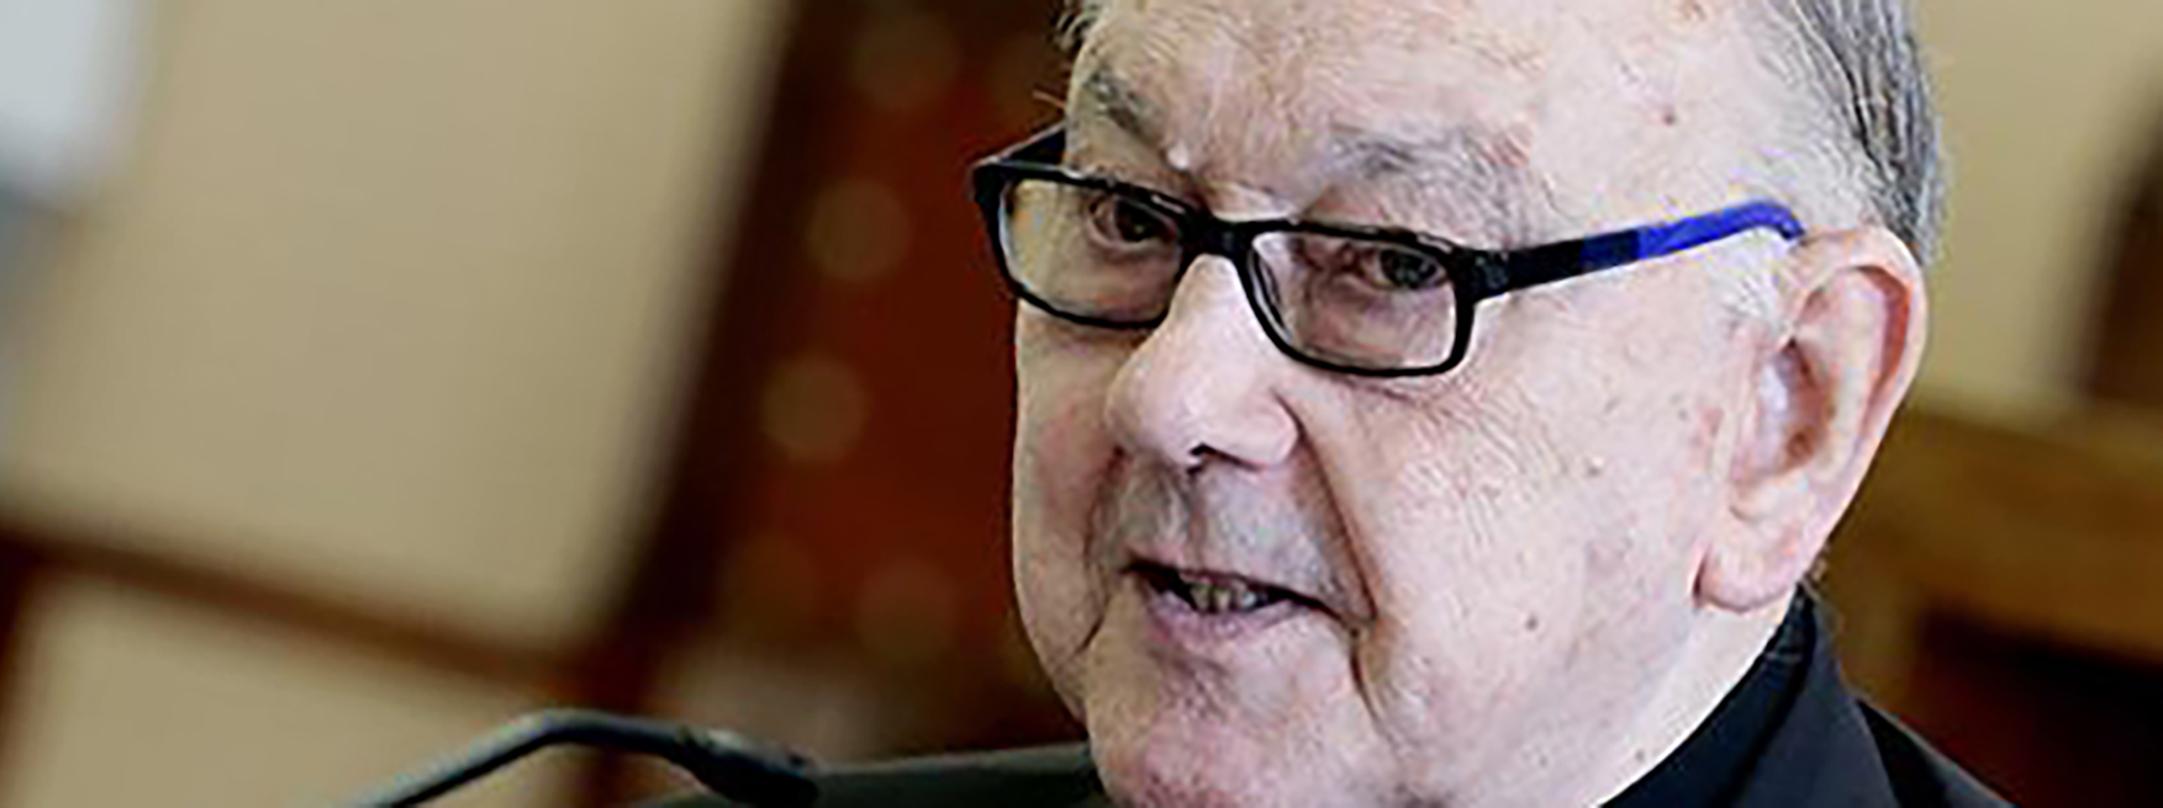 FALLECE EL CARDENAL FERNANDO SEBASTIÁN AGUILAR, CMF